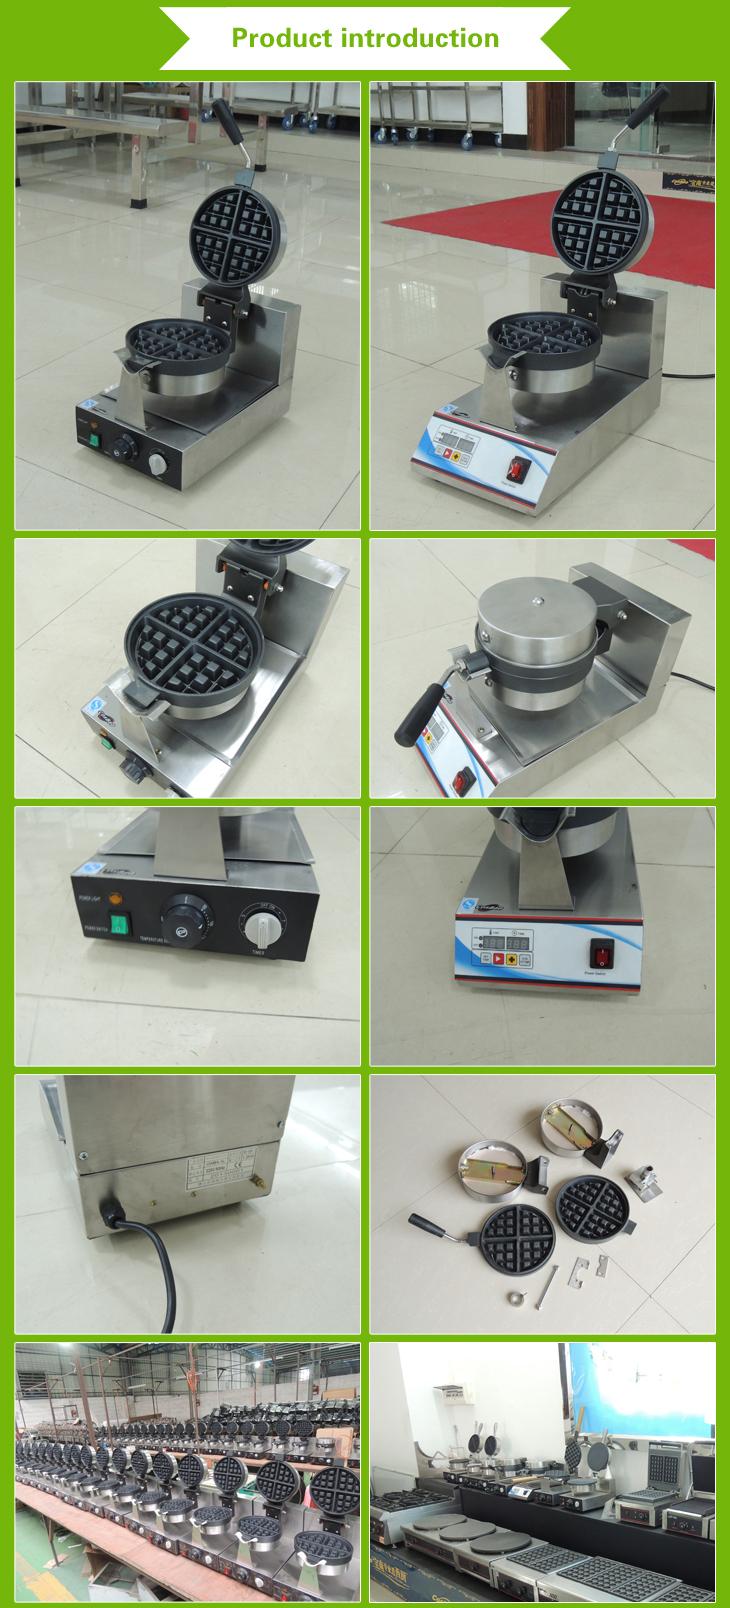 Cosbao names of kitchen equipments restaurant equipment 900 600 view -  Uwbf 2 Cosbao Egg Waffle Cone Maker Machine